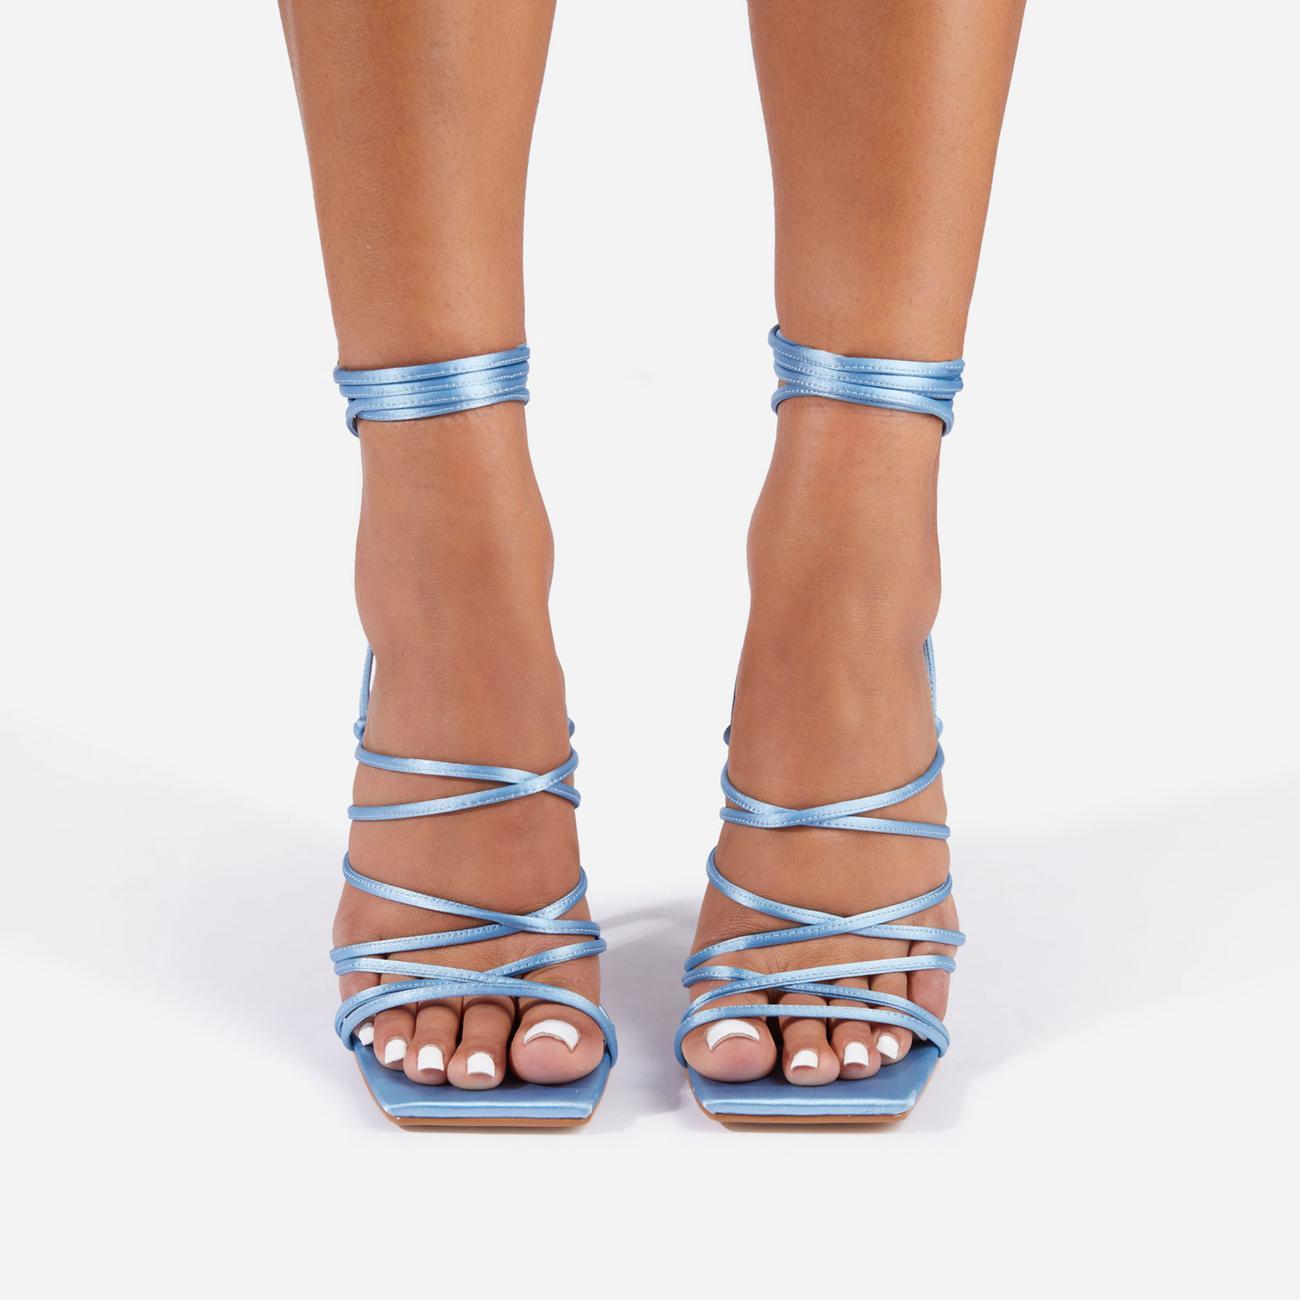 Donatella Strappy Lace Up Square Toe Heel In Blue Satin Image 3